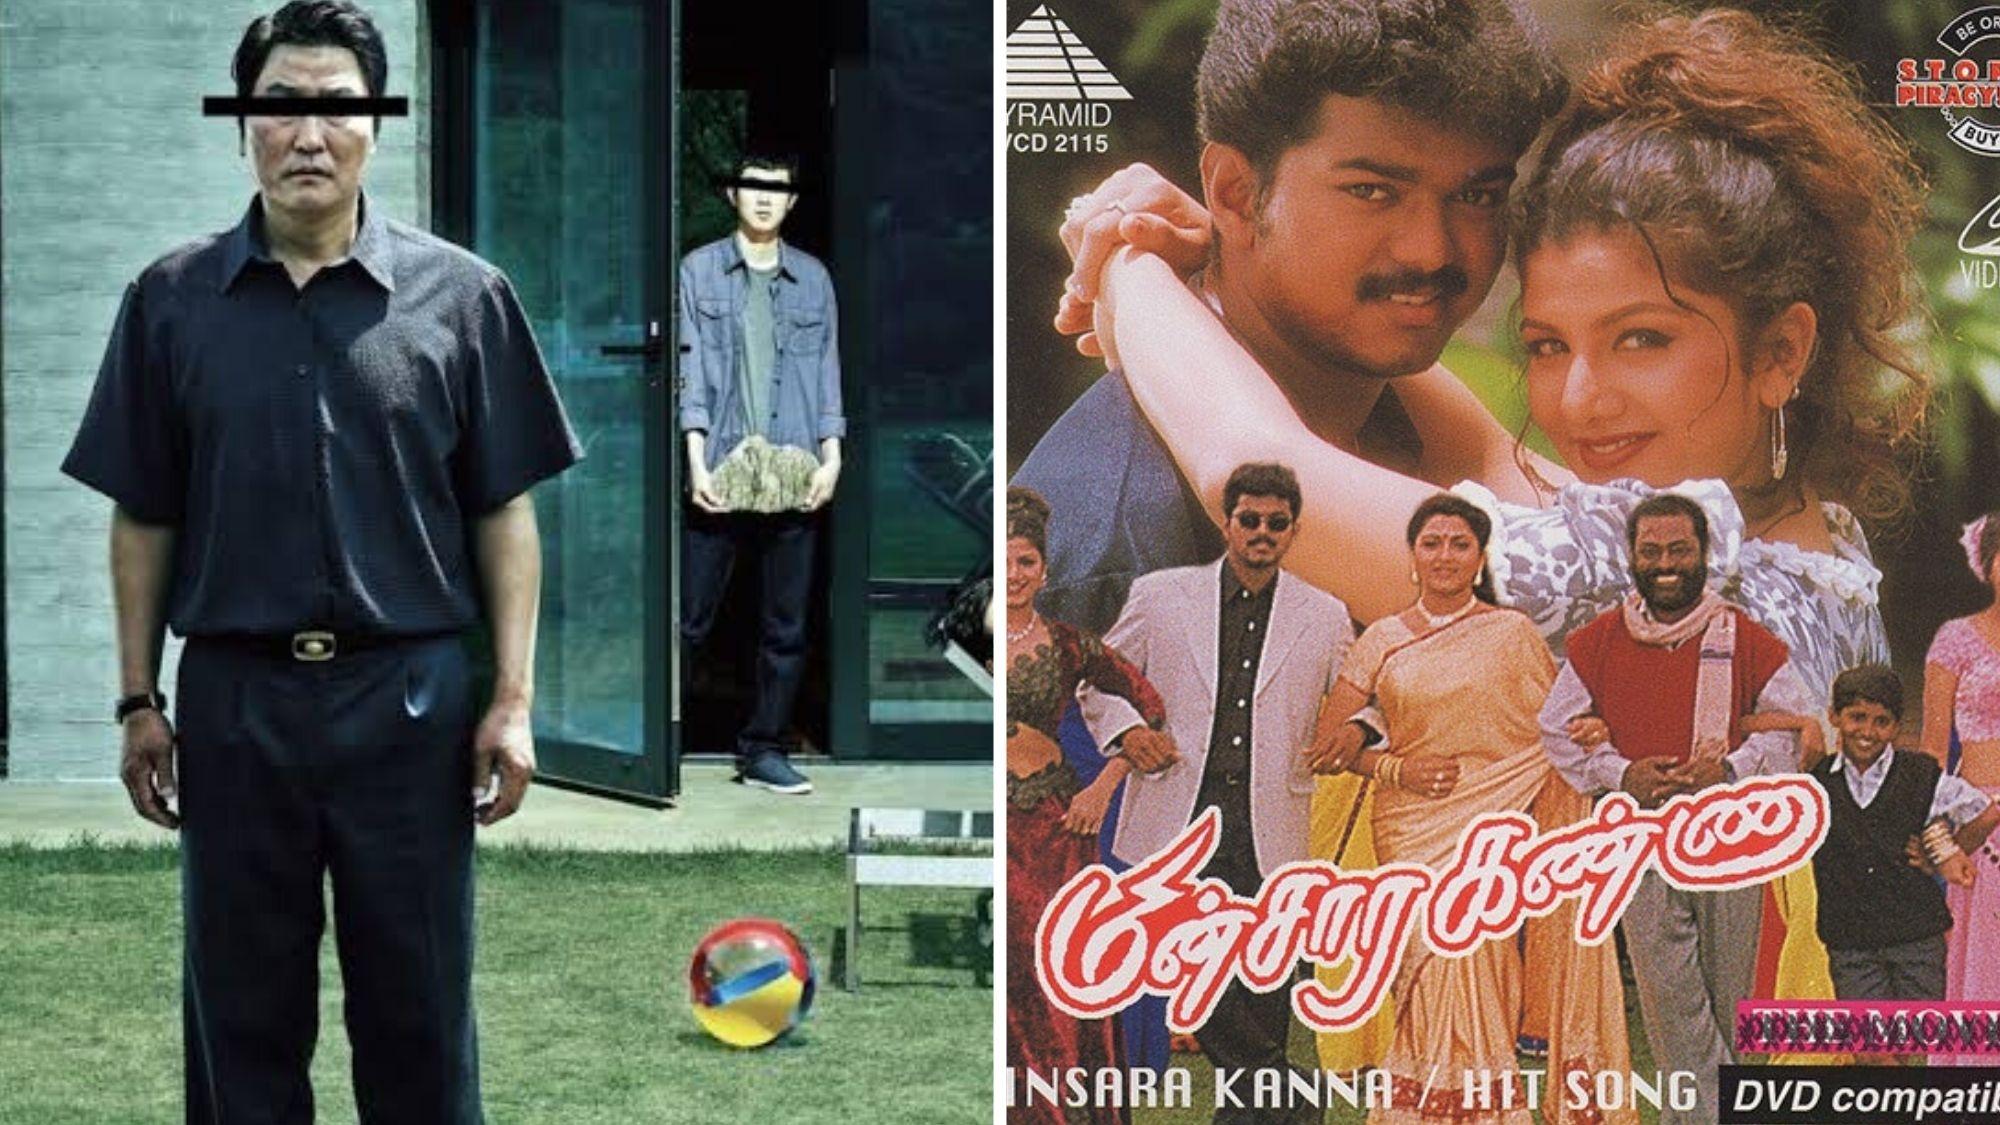 Oscar-Winner 'Parasite' Inspired by Vijay's Film, Claim His Fans